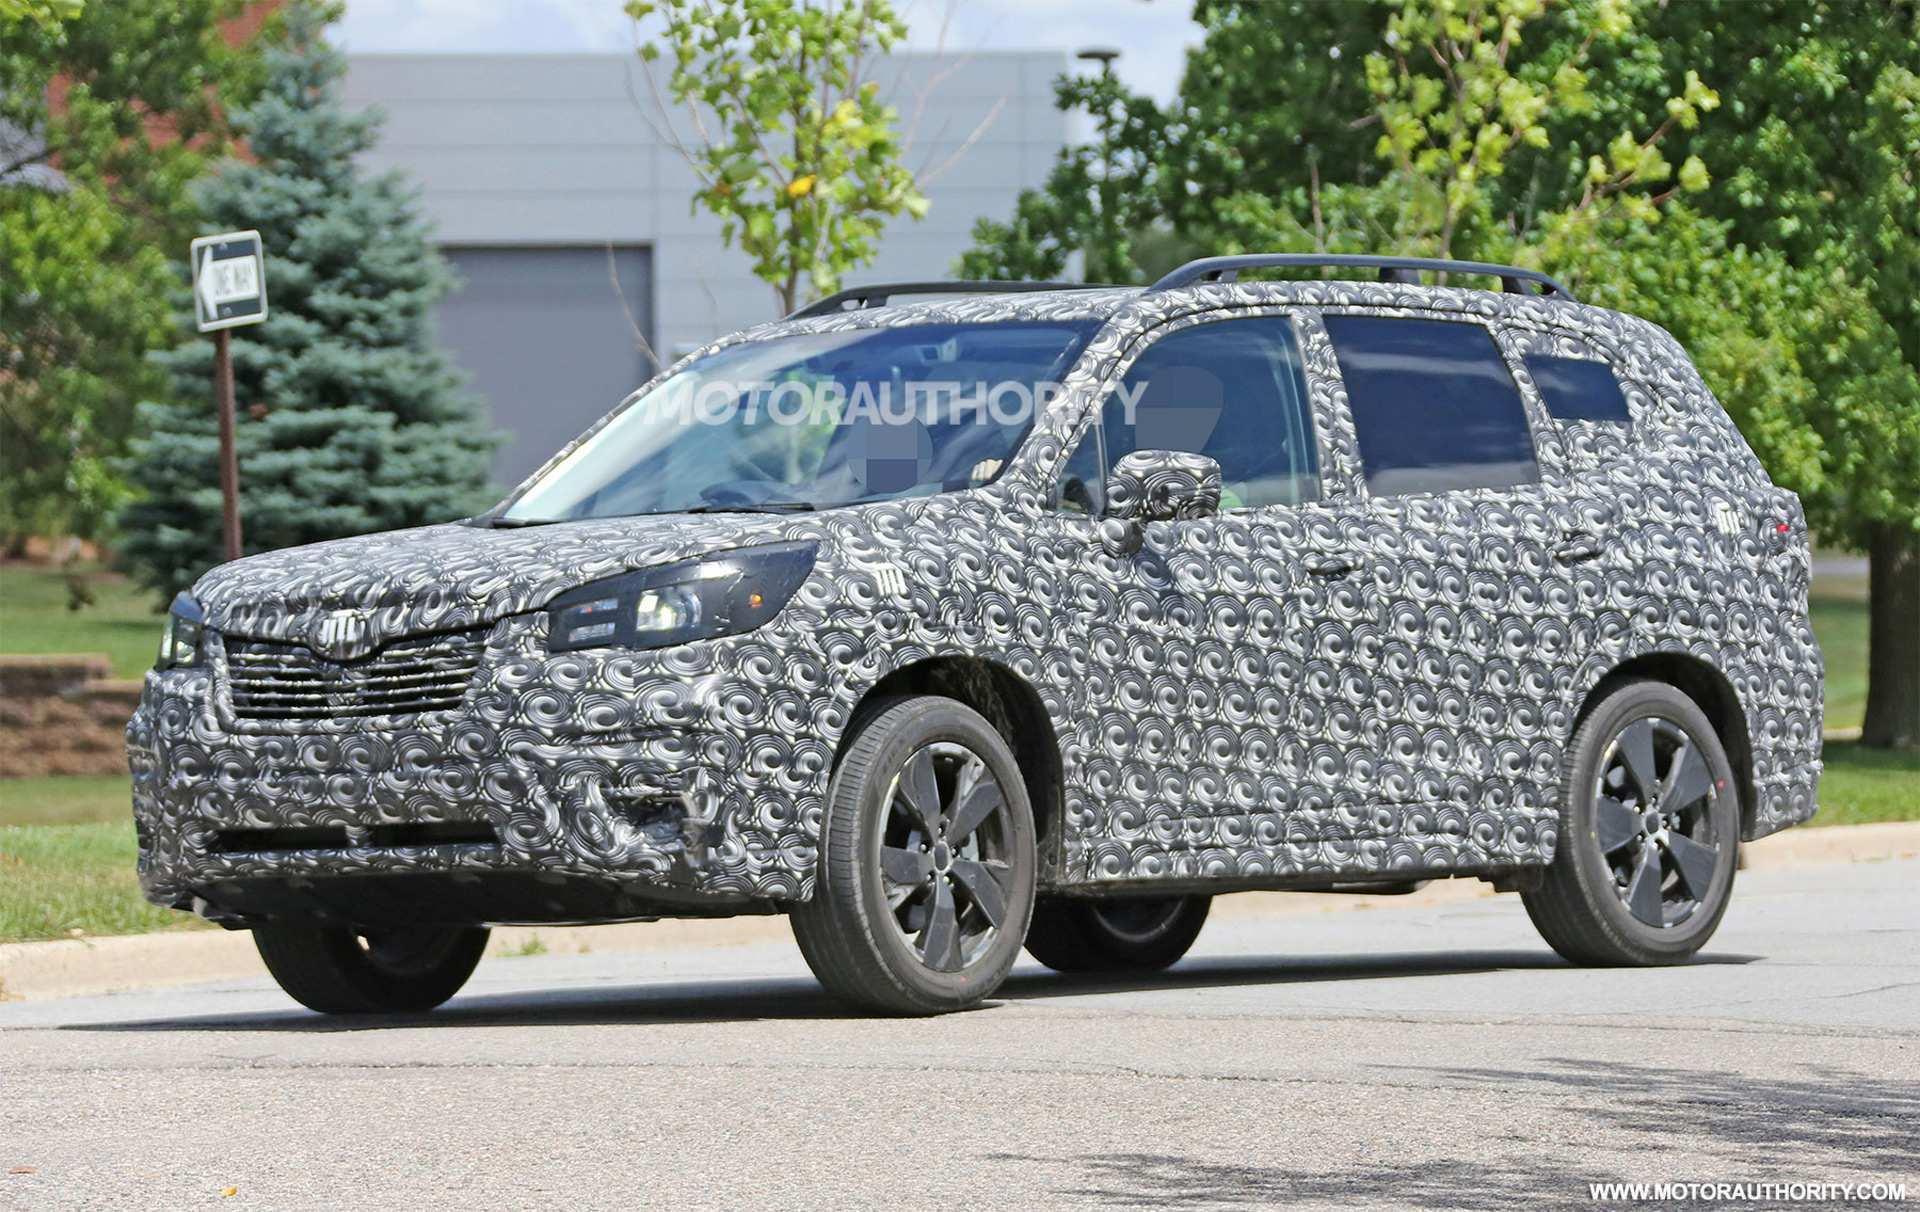 82 Concept of New Subaru Cars 2019 Spy Shoot Concept with New Subaru Cars 2019 Spy Shoot